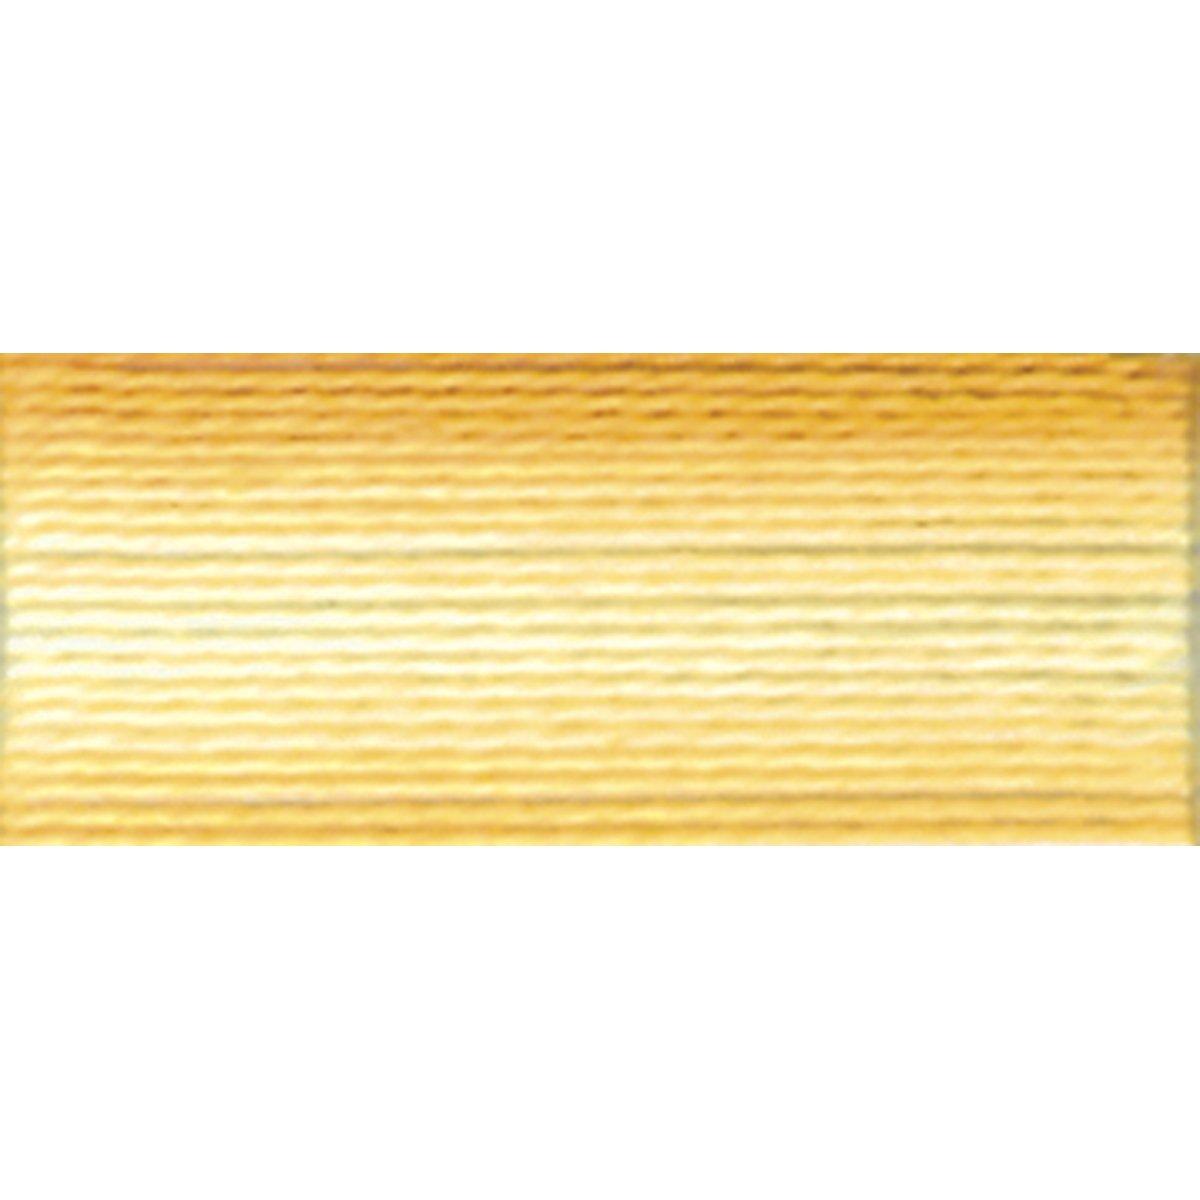 DMC Pearl Cotton Ball Size 8 87yd-Aquamarine 116 8-3814